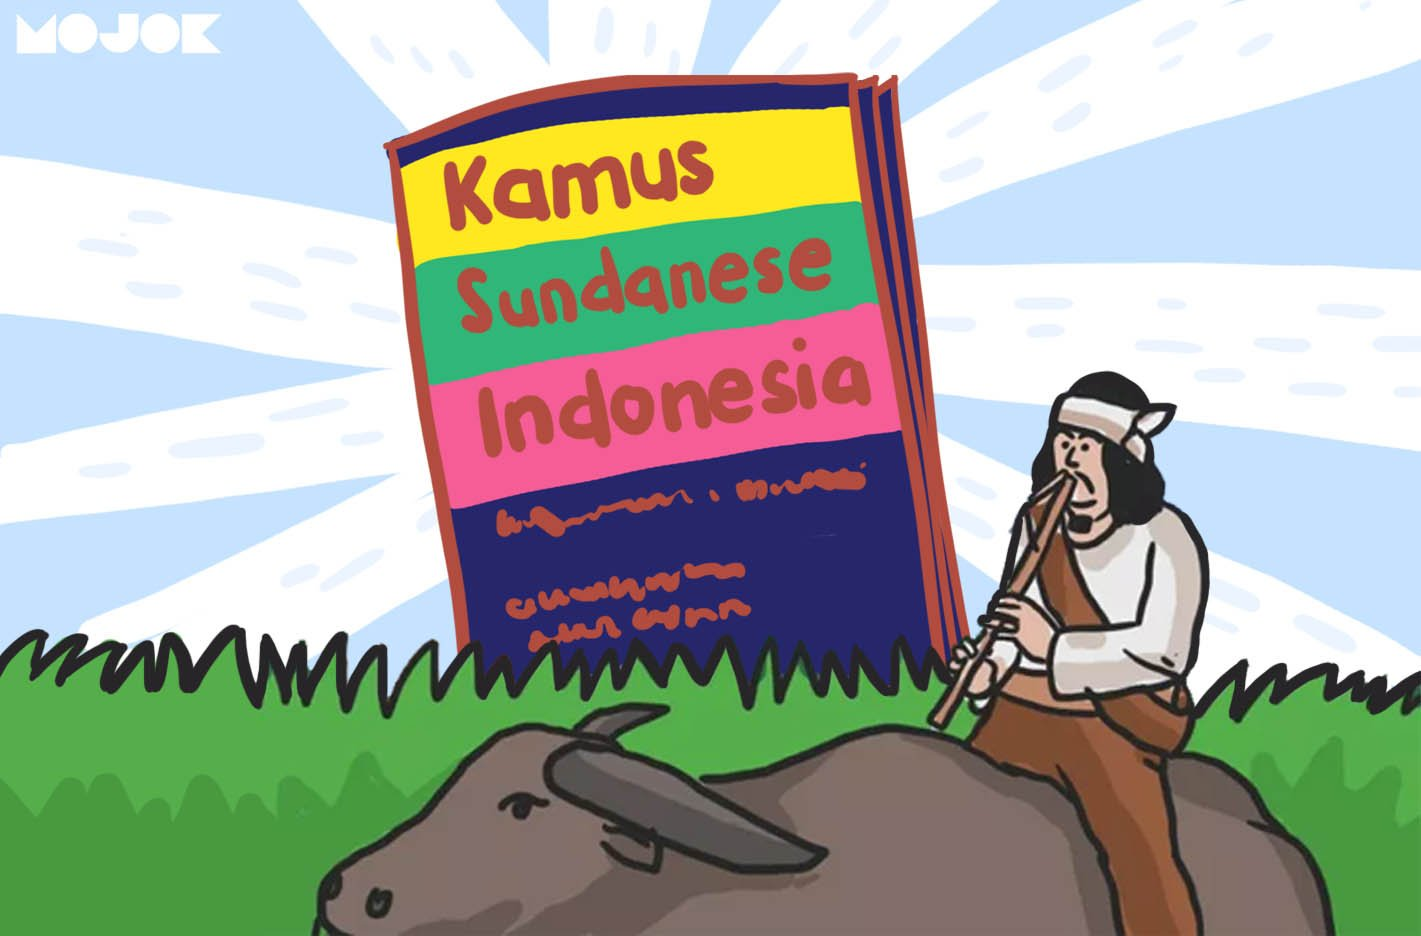 Panduan Belajar Bahasa Sunda Yang Tidak Baik Dengan Benar